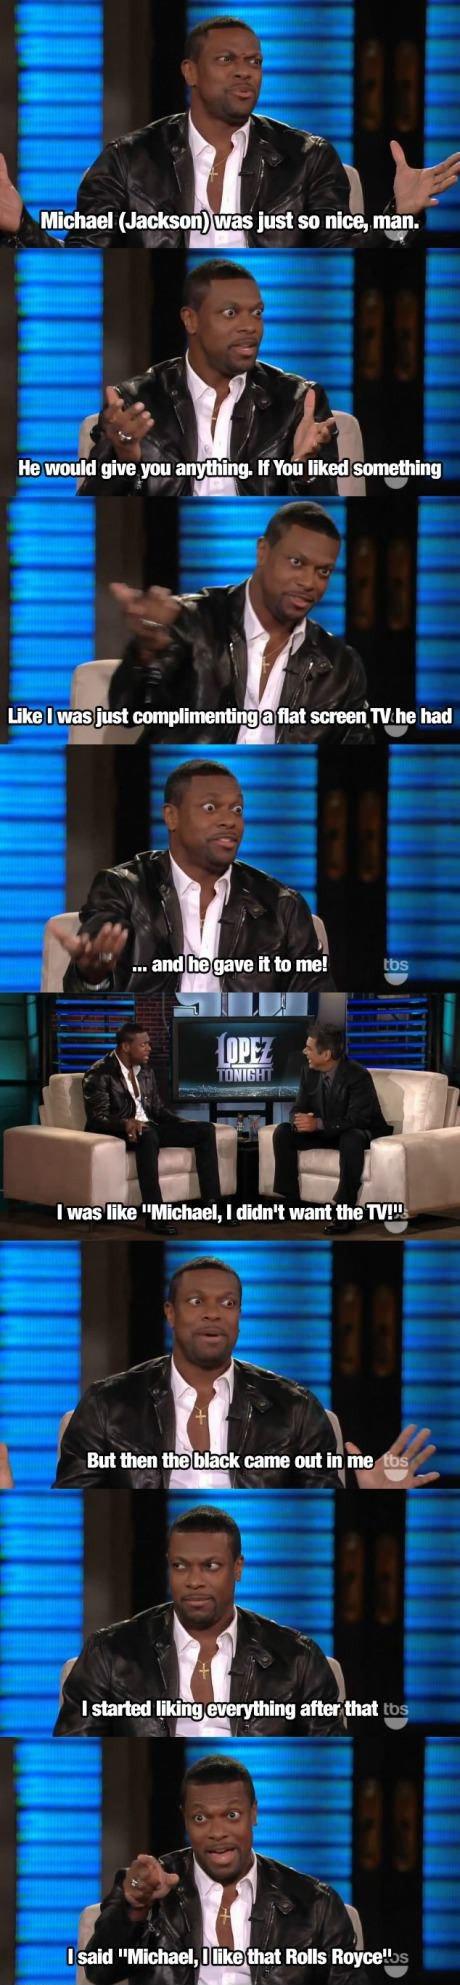 "Jackson 5. Source: Talk show. Michael (. was just SOI nice, main. He would ""if/ ts it , iraniie something Like I "" l? iust -ii' Fiat screen'_ w he had I was) li Jackson 5 Source: Talk show Michael ( was just SOI nice main He would ""if/ ts it iraniie something Like I "" l? iust -ii' Fiat screen'_ w he had was) li"